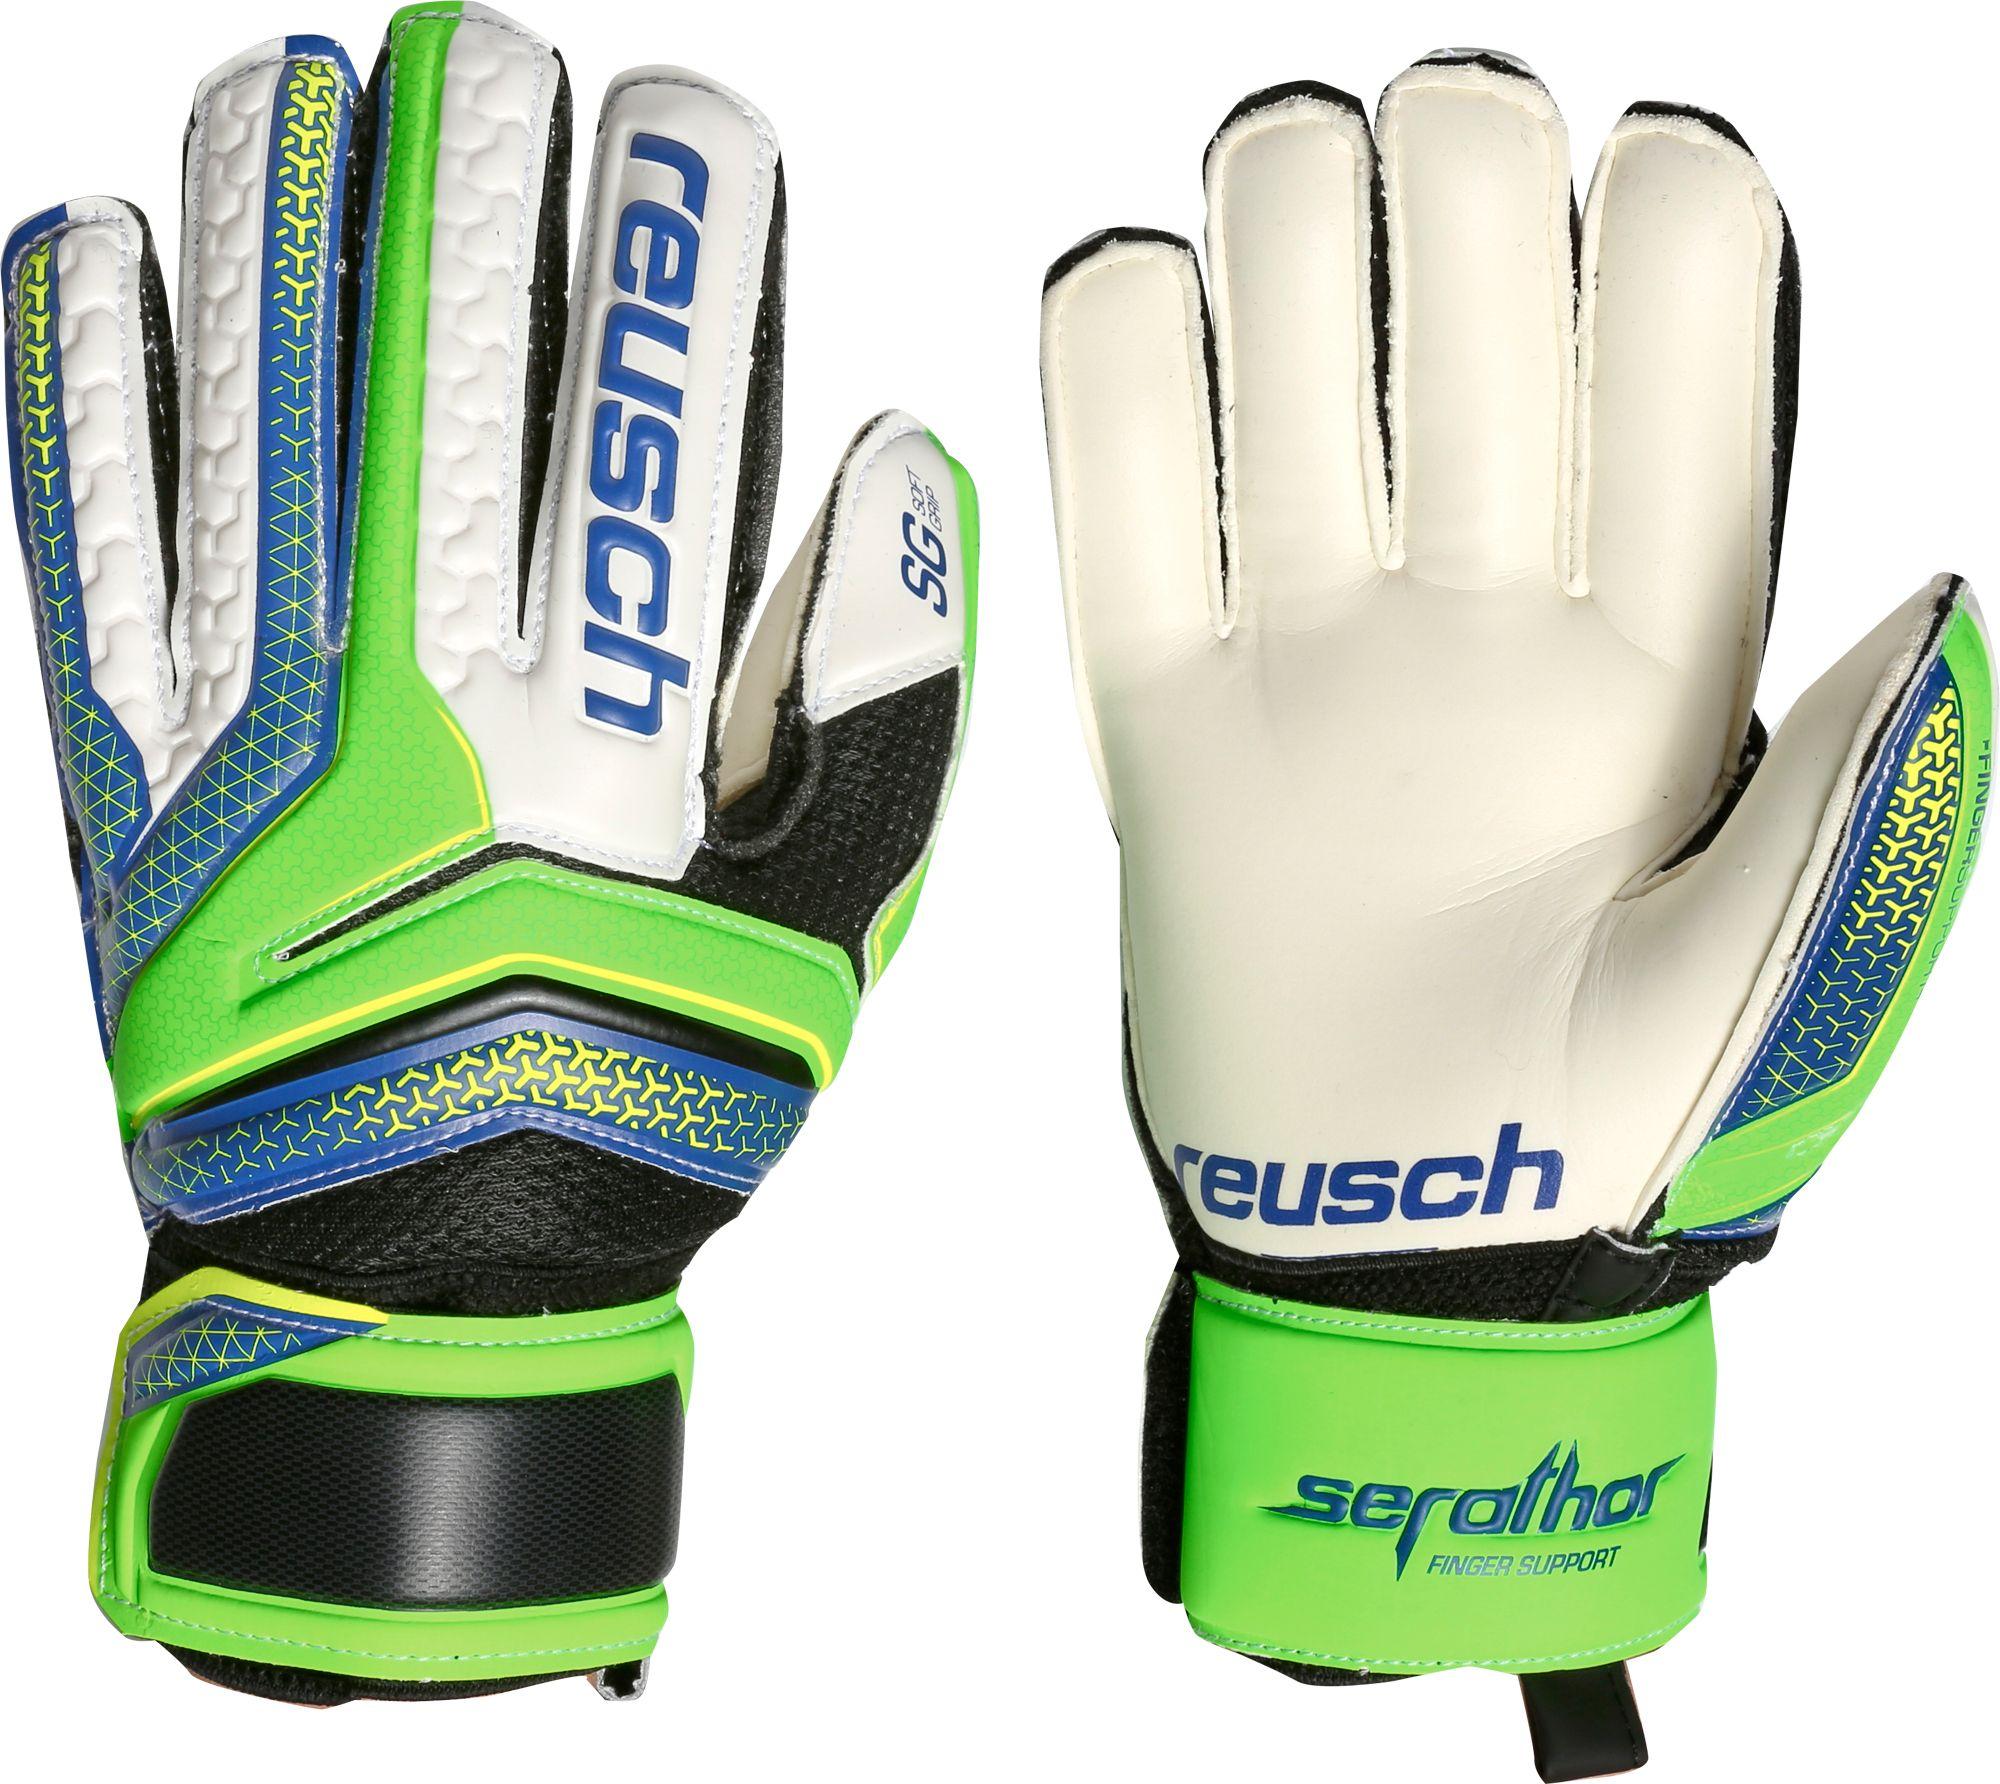 Womens leather gloves green - Product Image Reusch Junior Serathor Sg Finger Support Soccer Goalie Gloves